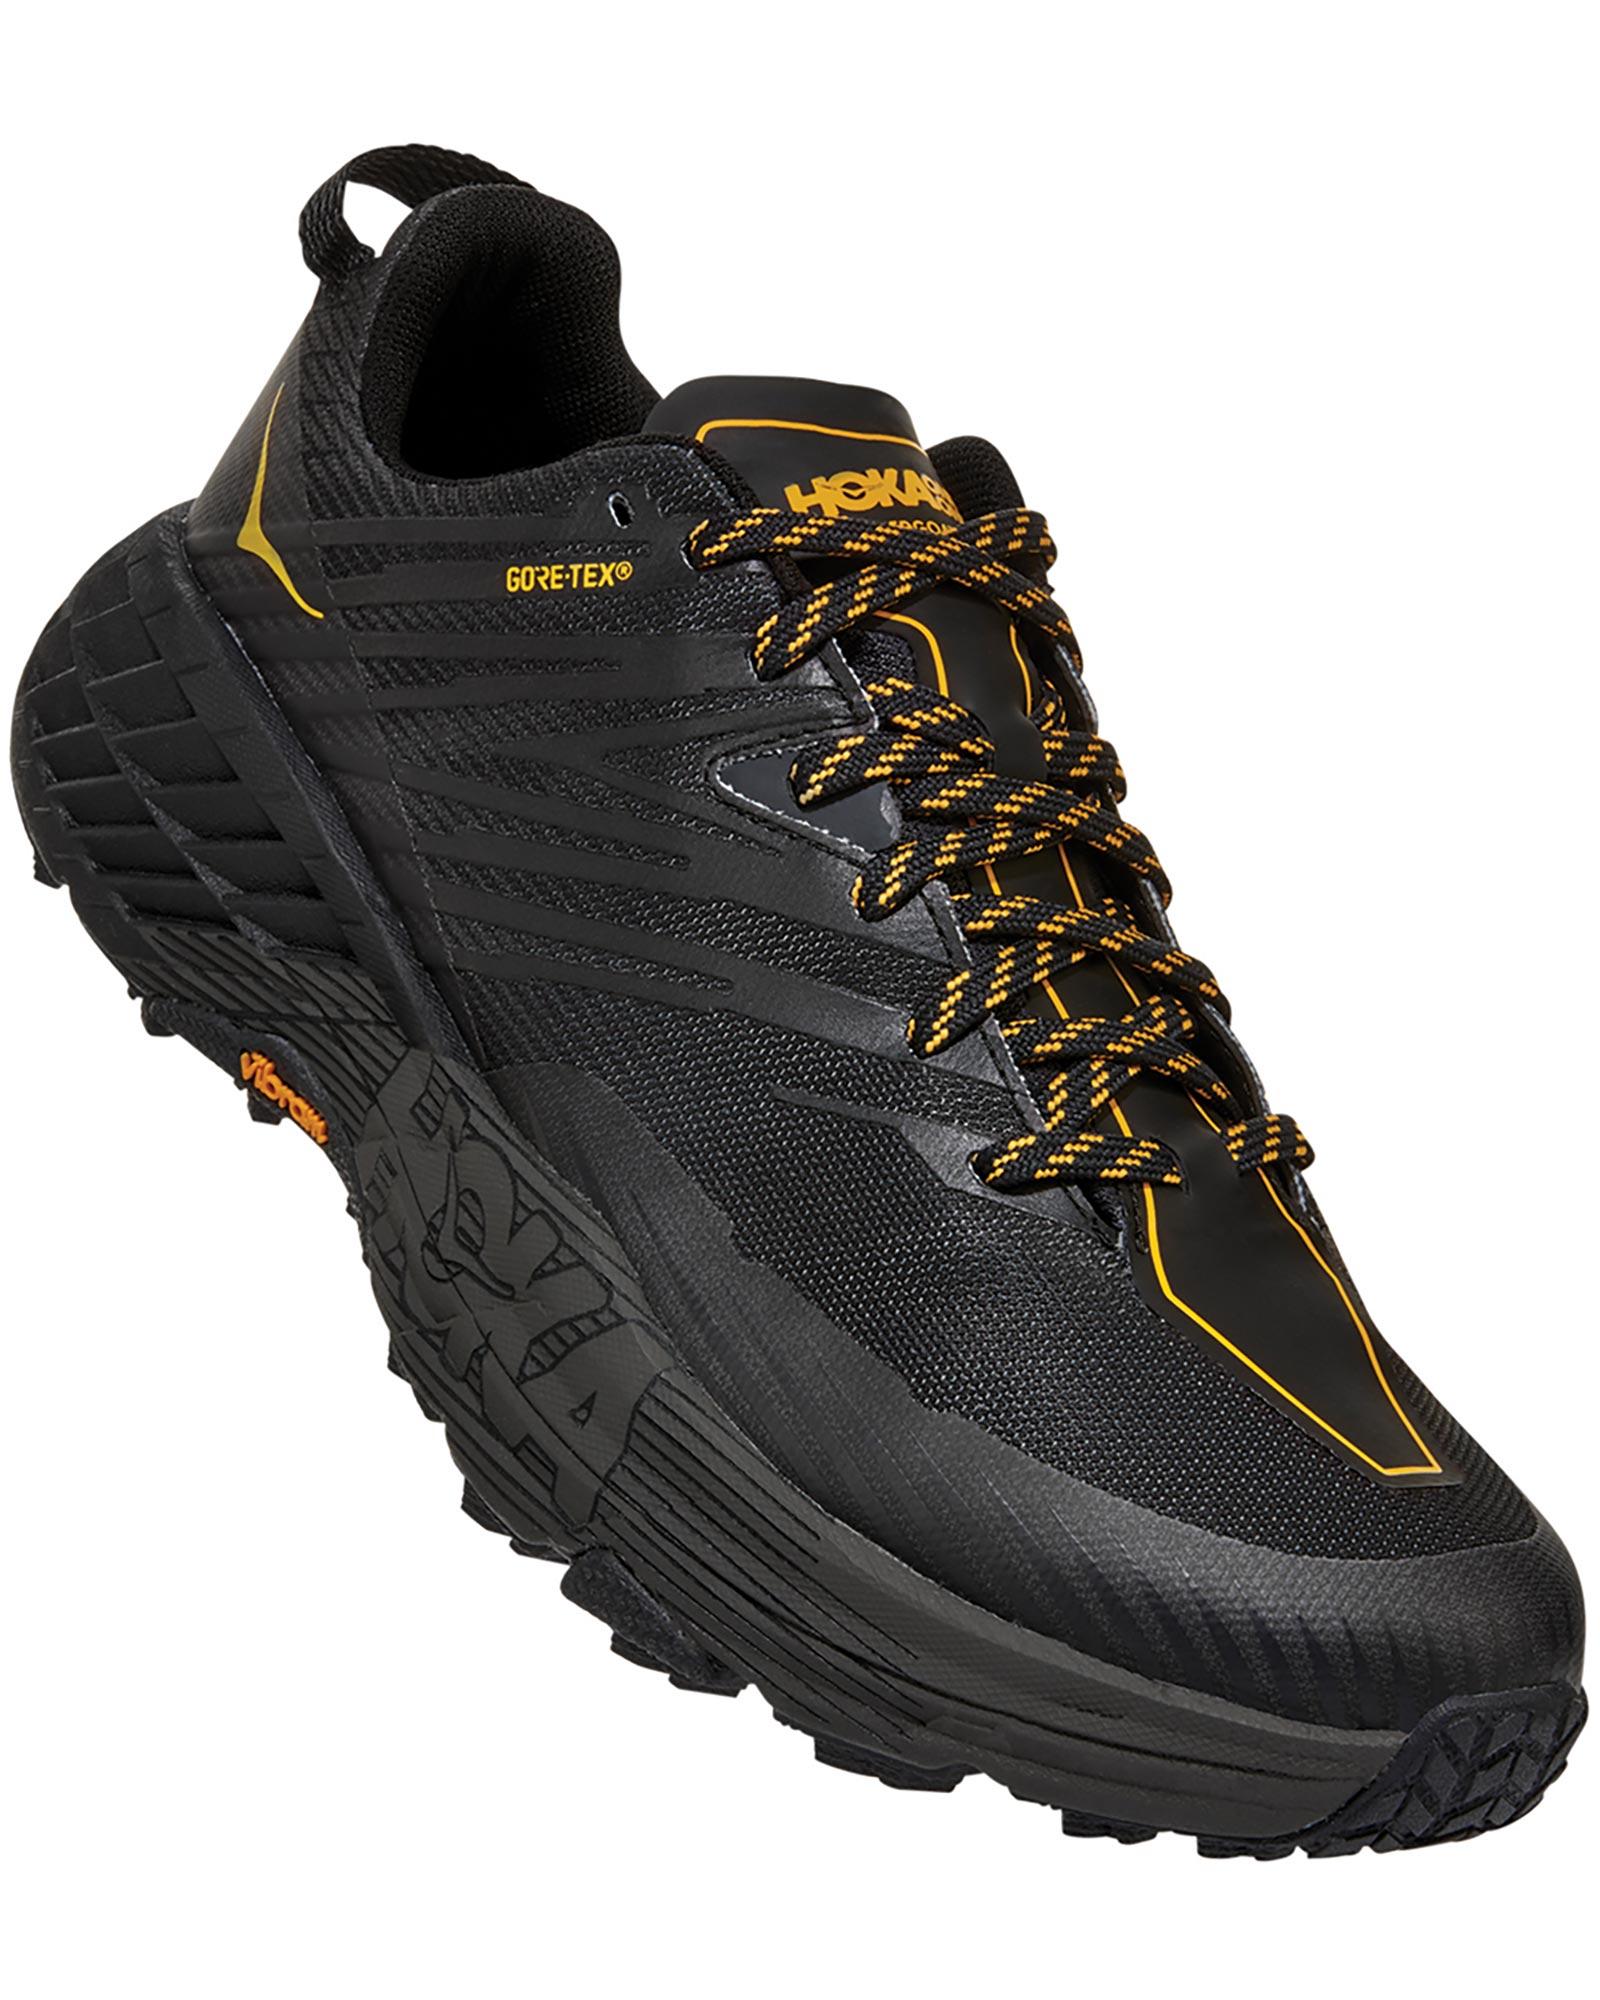 Hoka One One Speedgoat 4 GORE-TEX Men's Shoes 0